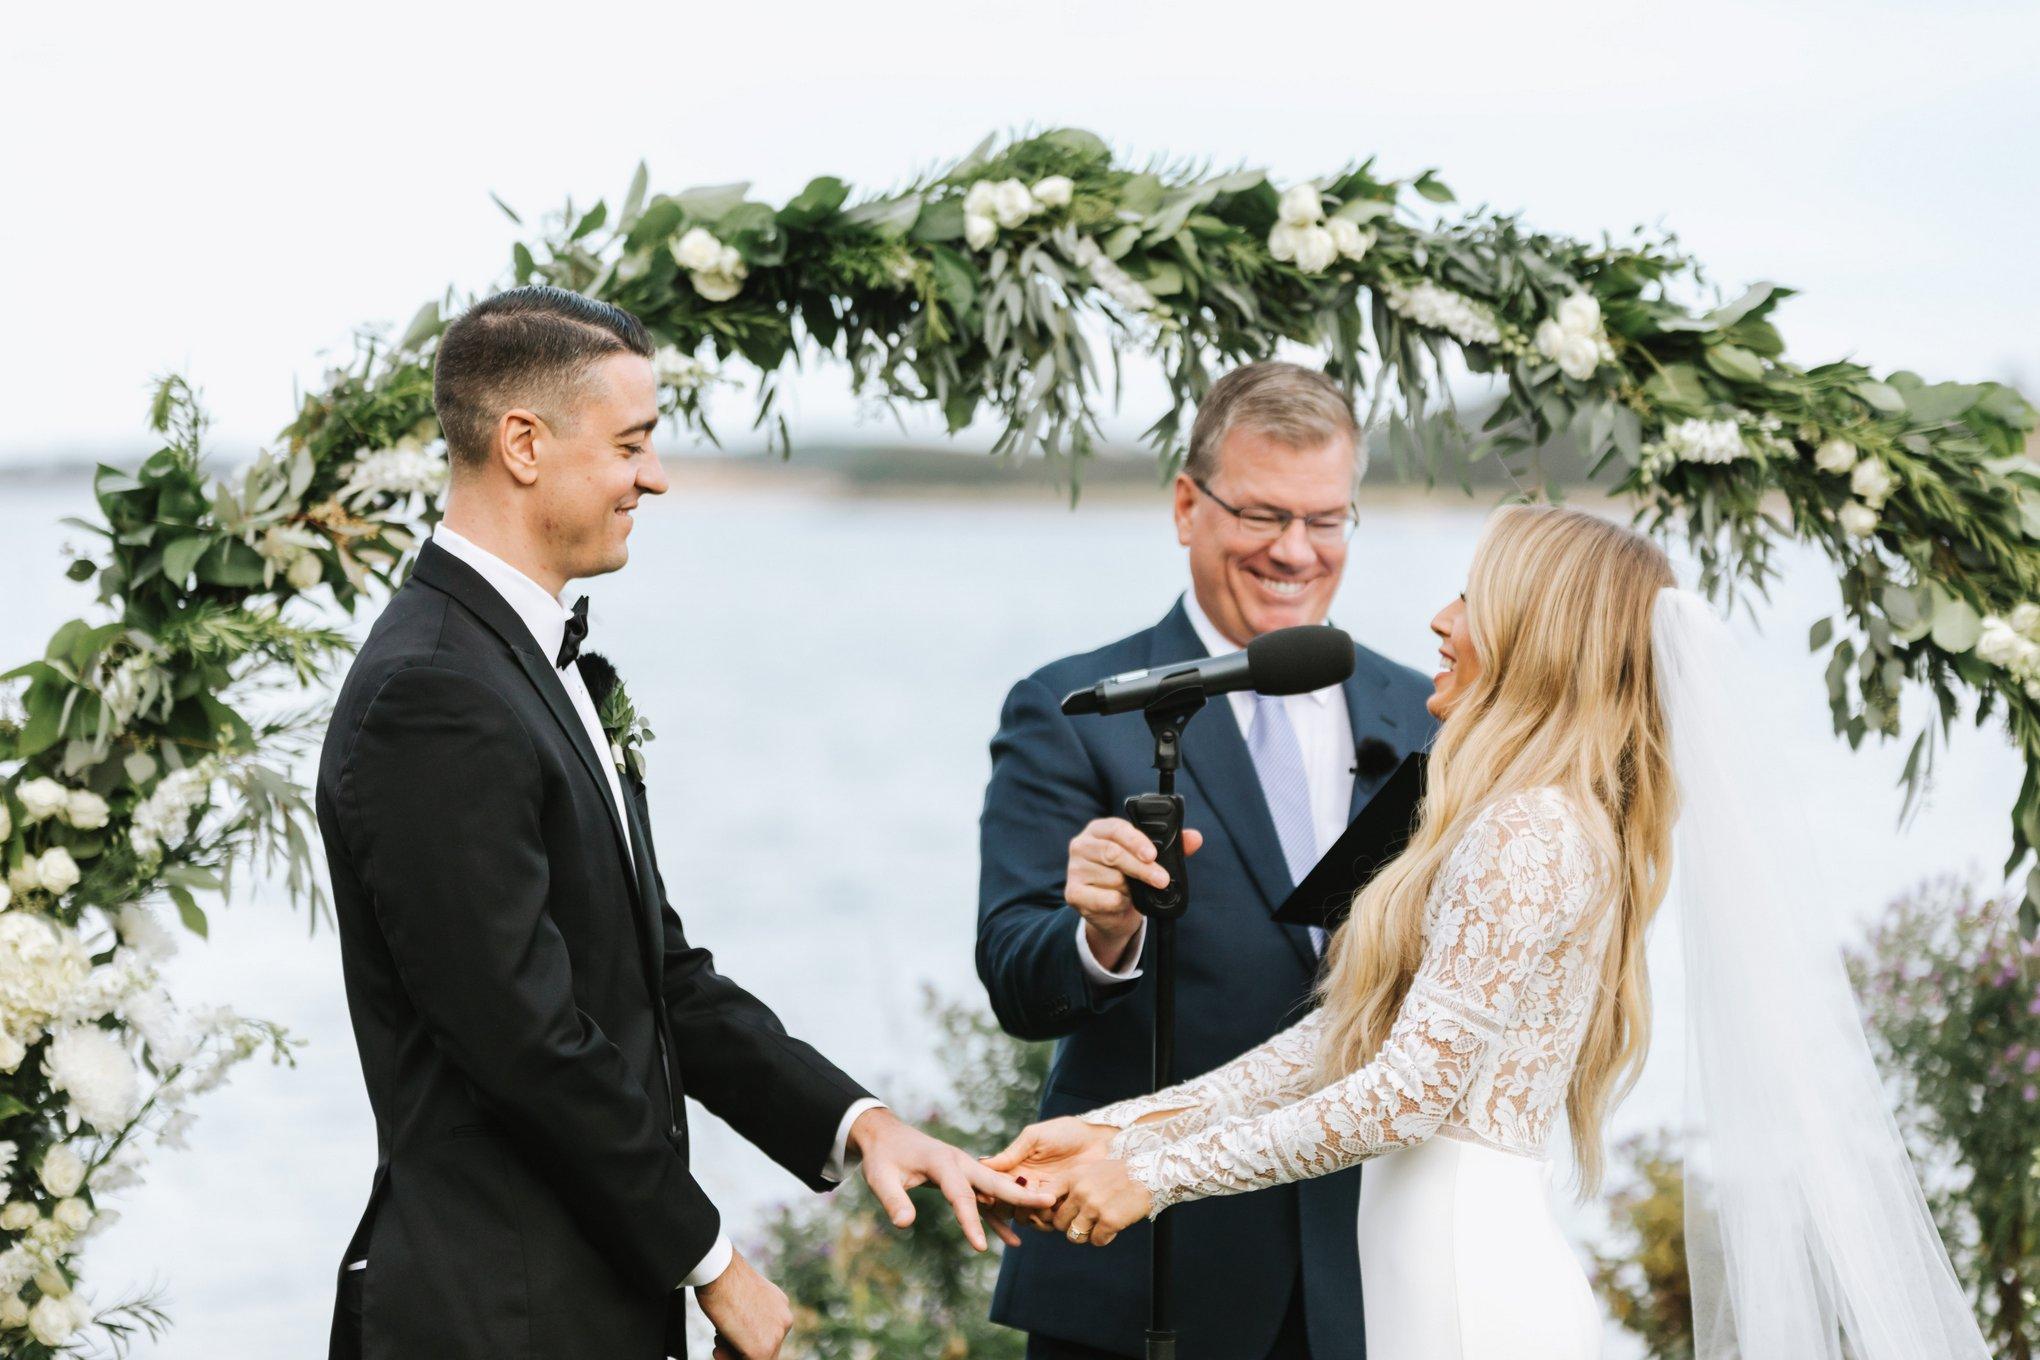 Wequassett-Wedding-Photographer-Cape-Cod-Boston-Lena-Mirisola-28.jpg